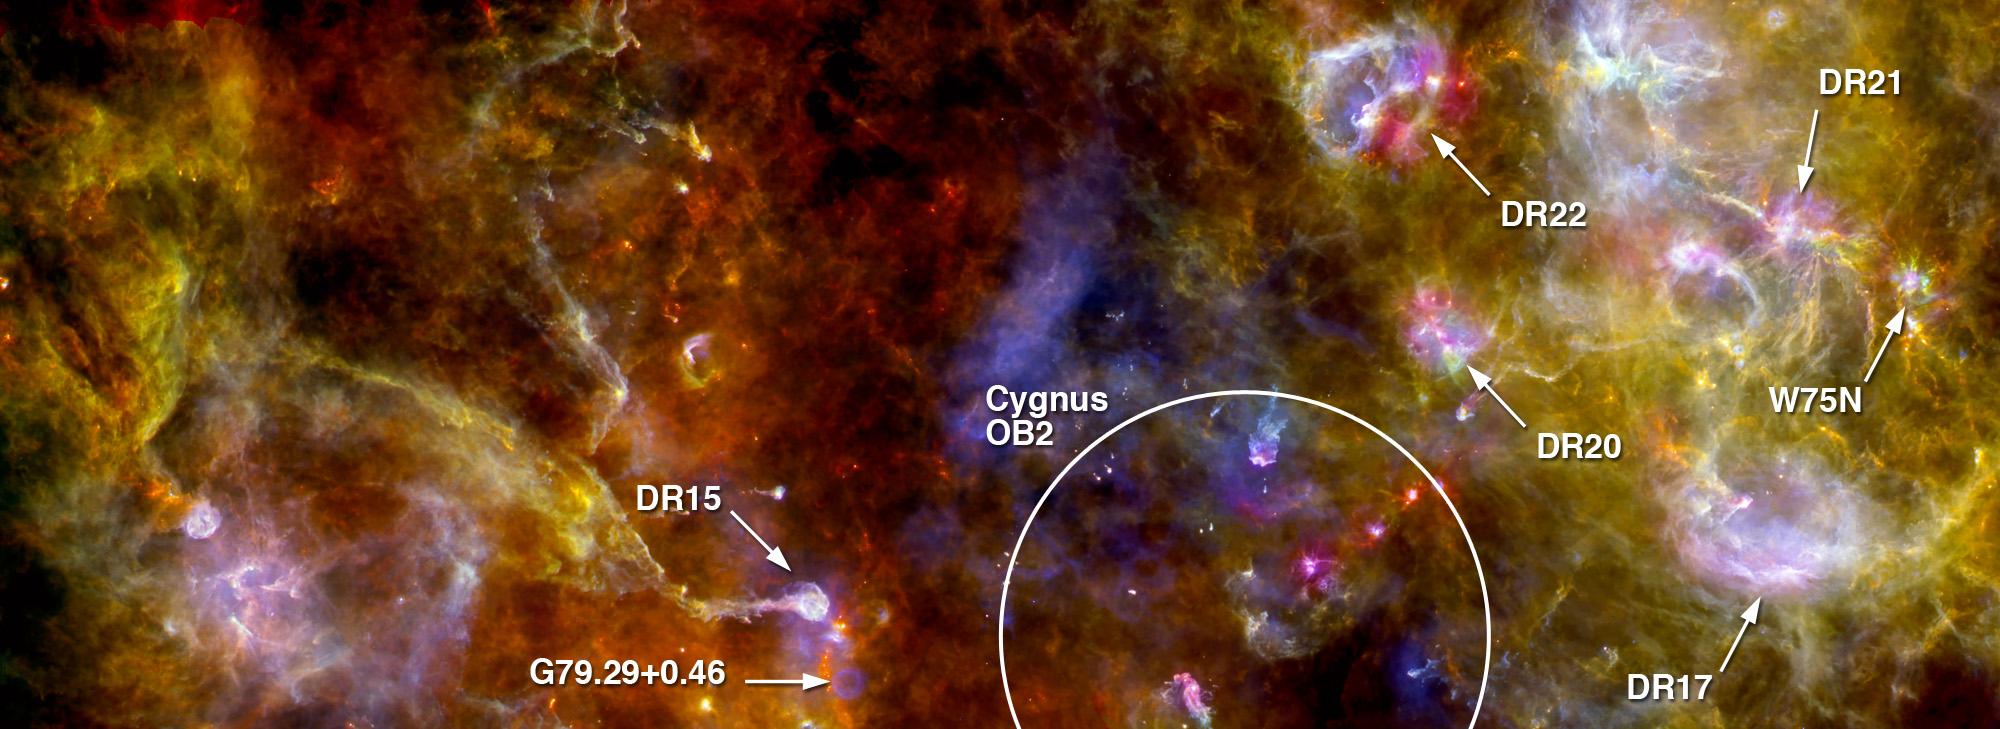 1567217370964-Herschel_CygnusX_07052012_horizontal_Annotated_2kb.jpg